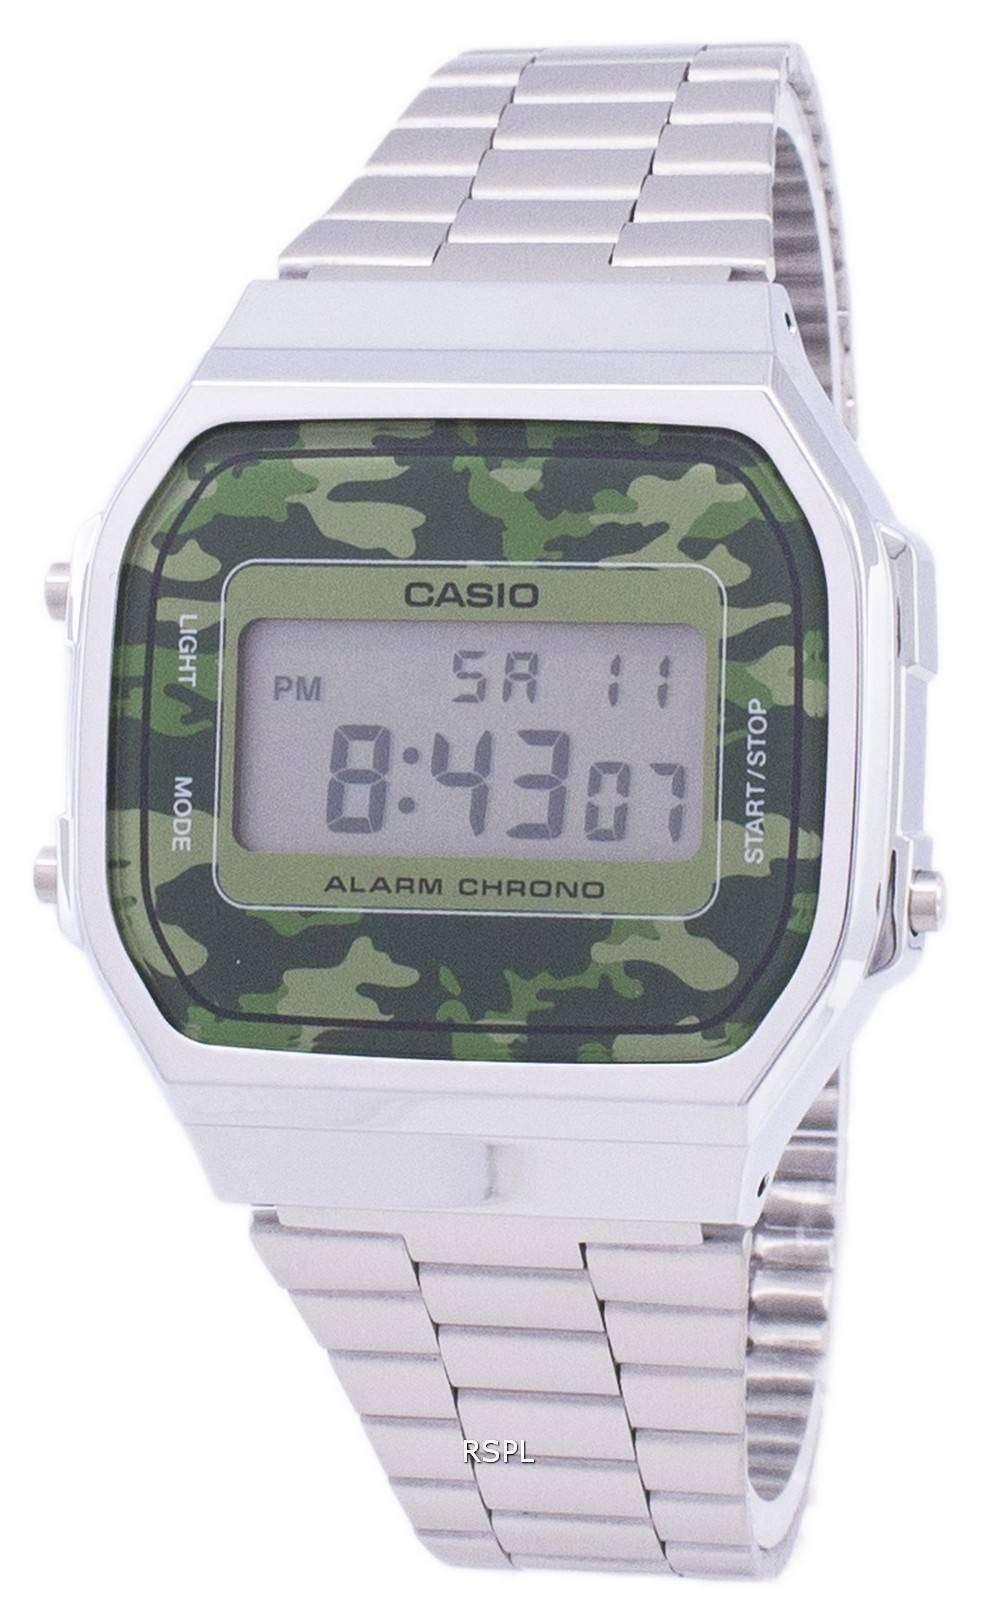 ab1b317f56f5 Reloj Unisex de Casio Retro camuflaje Digital alarma Chrono A168WEC ...